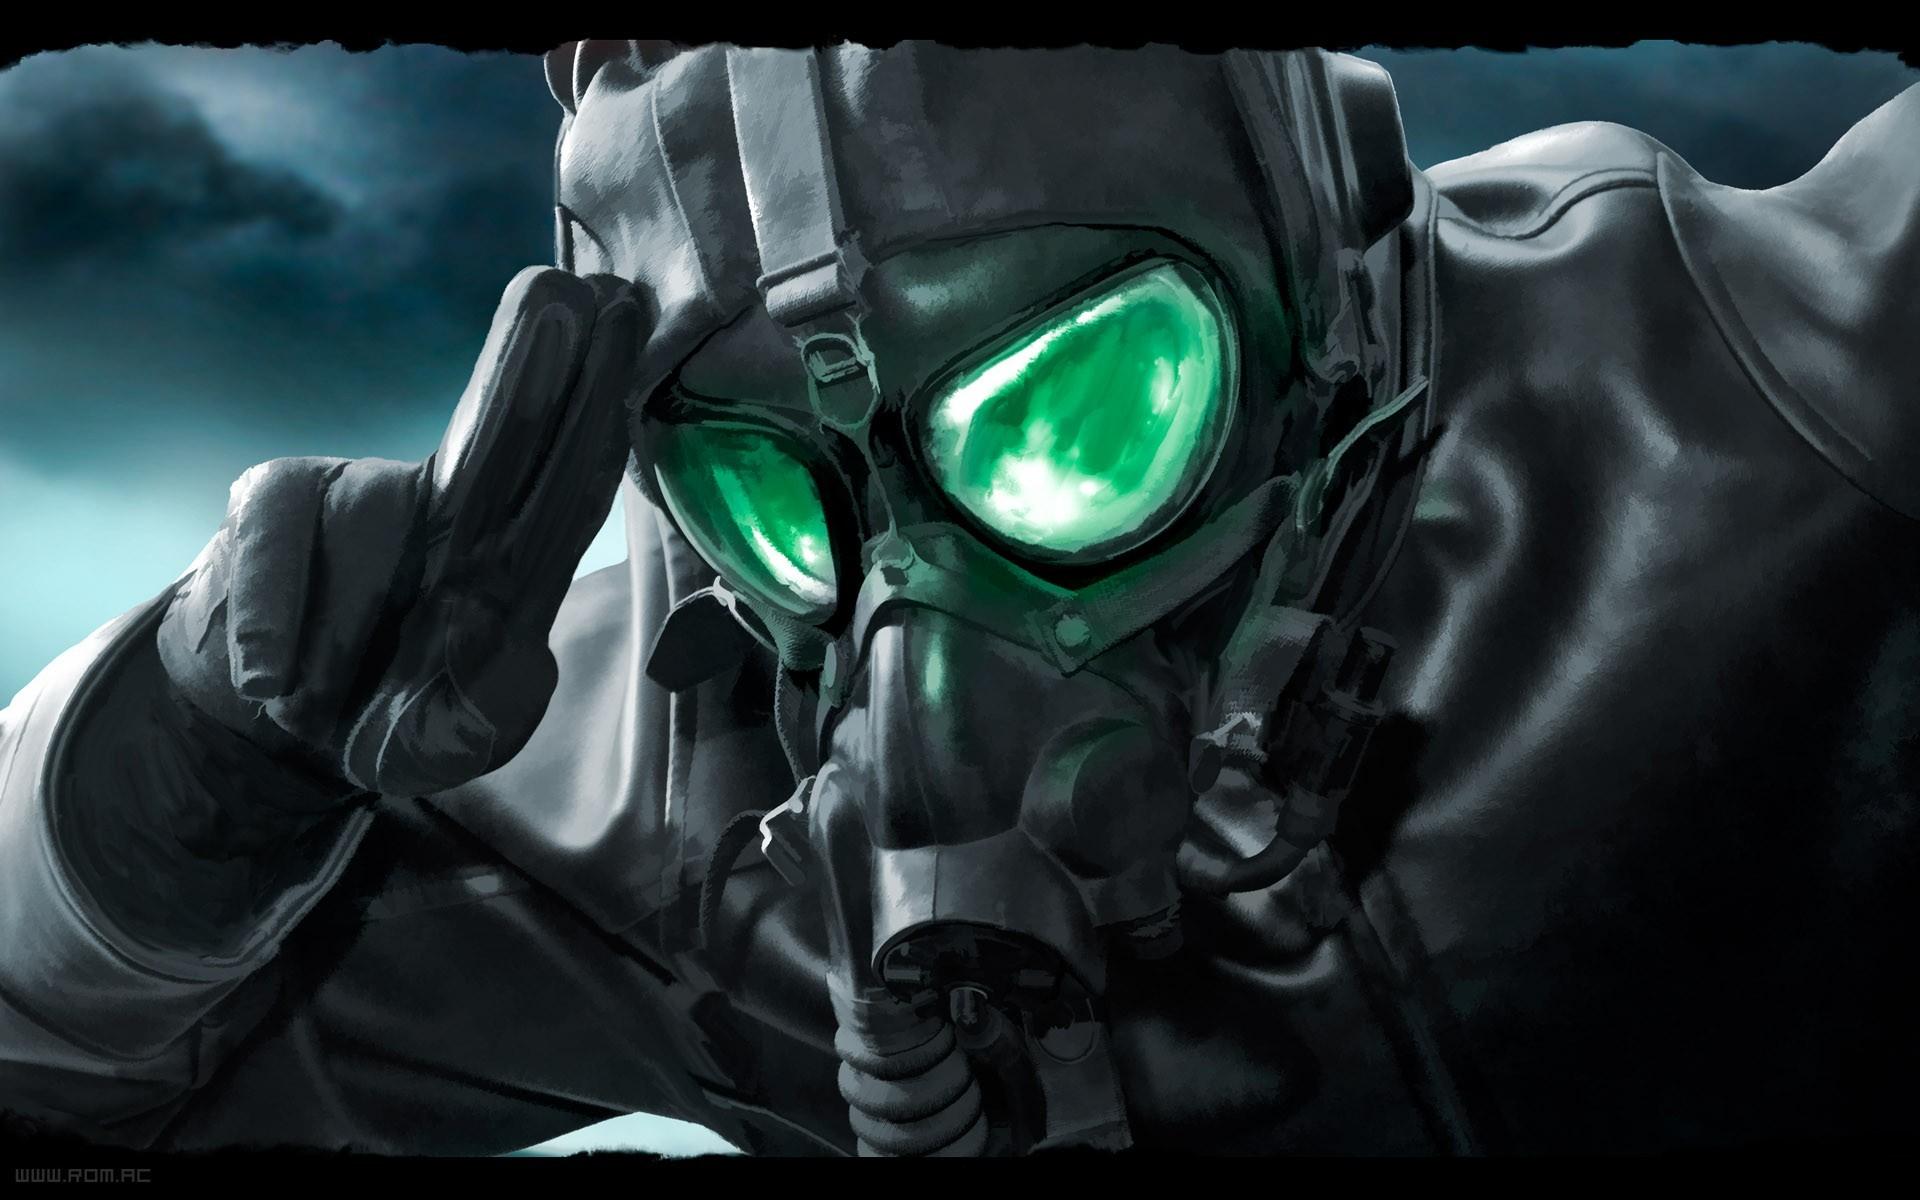 Wallpaper Gas Masks Apocalyptic Mask Vitaly S Alexius